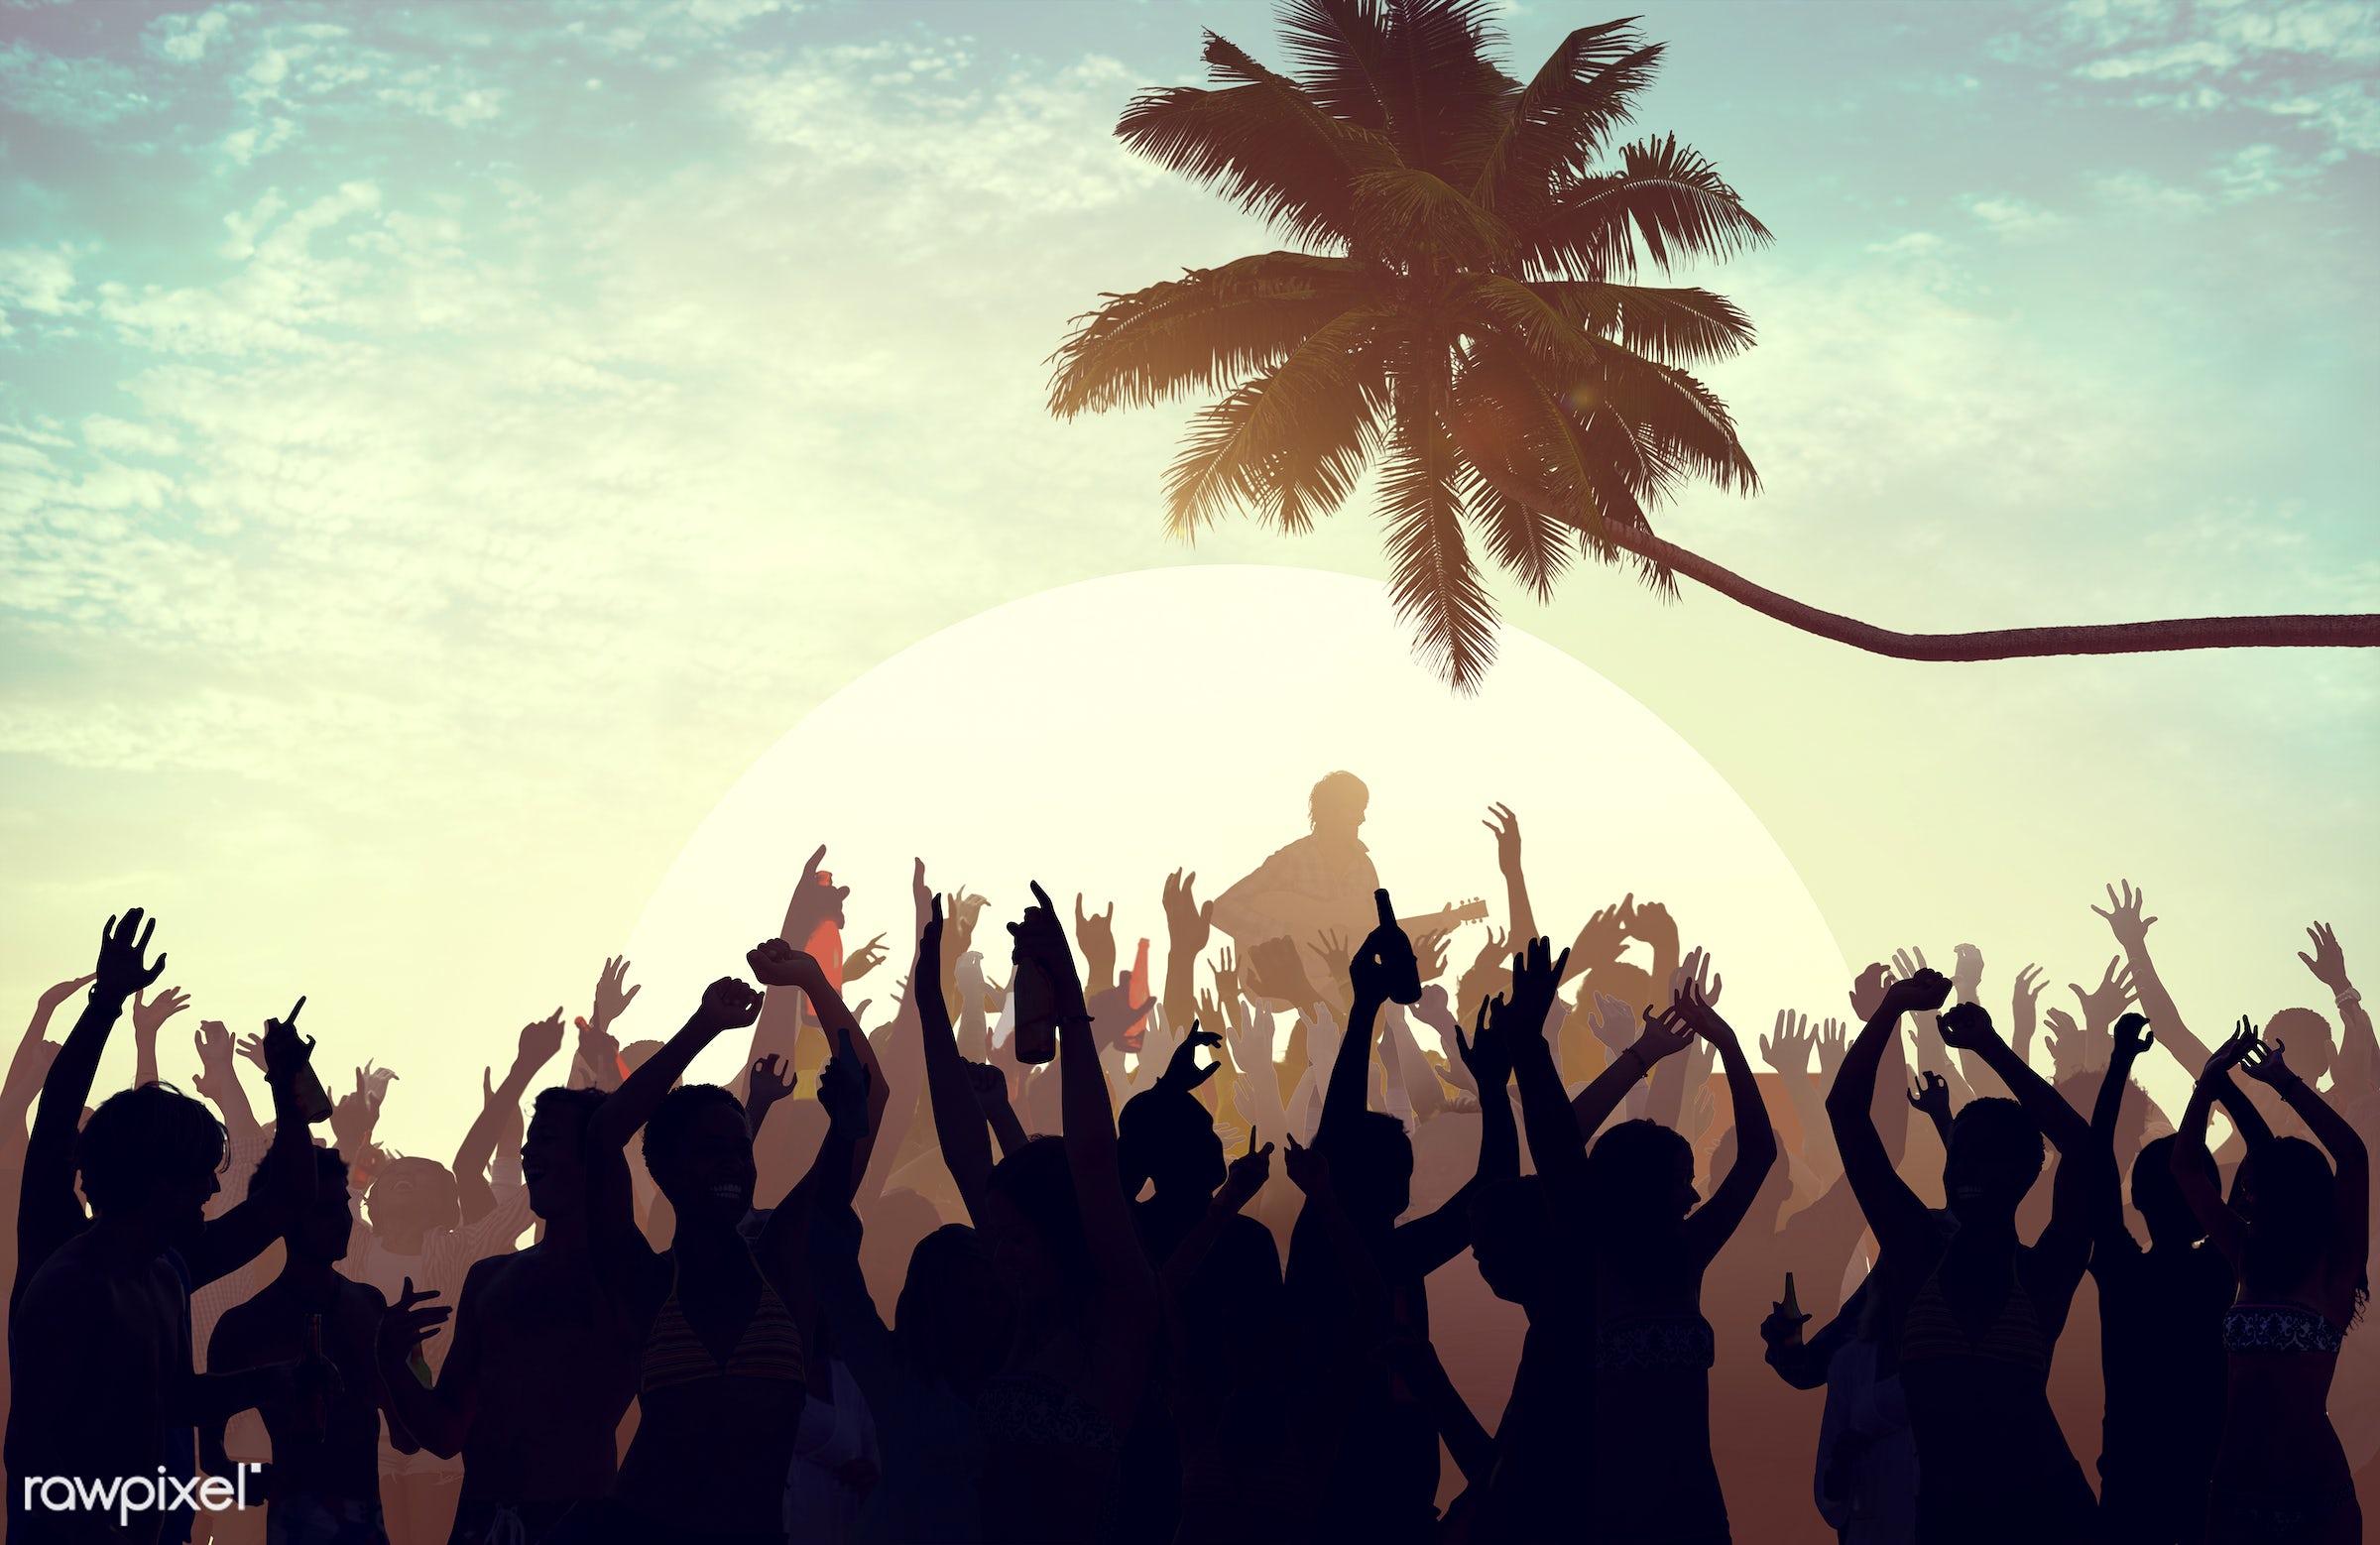 adolescence, audience, back lit, carefree, celebration, cheerful, coconut palm tree, communication, community, concert,...